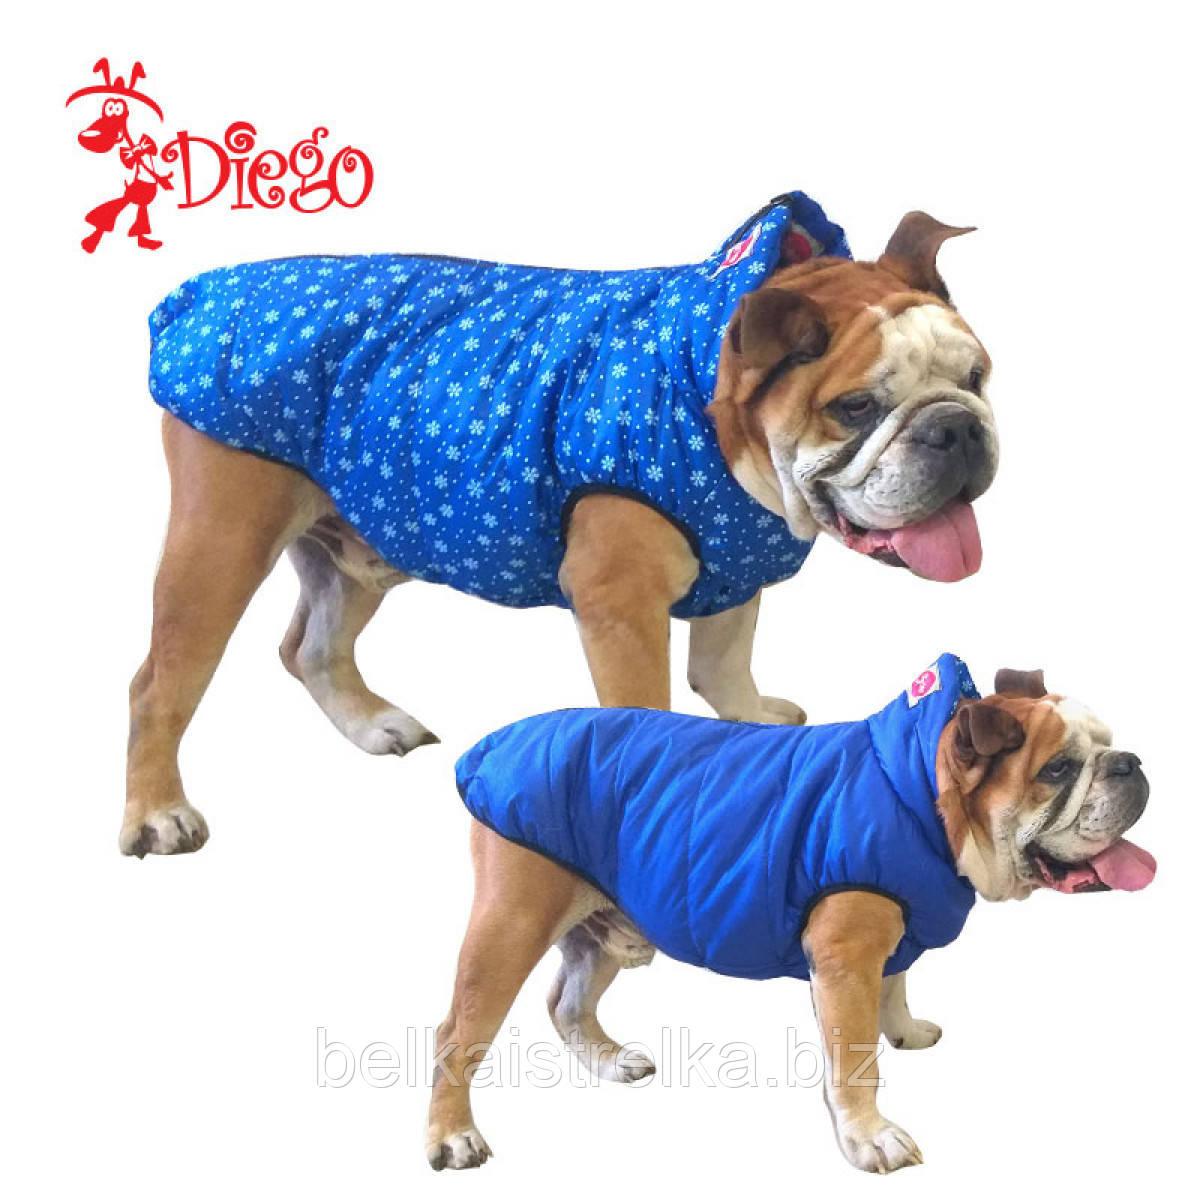 Жилет для собаки двухсторонний DIEGO sport double 5/9 Снежинки, размер 5